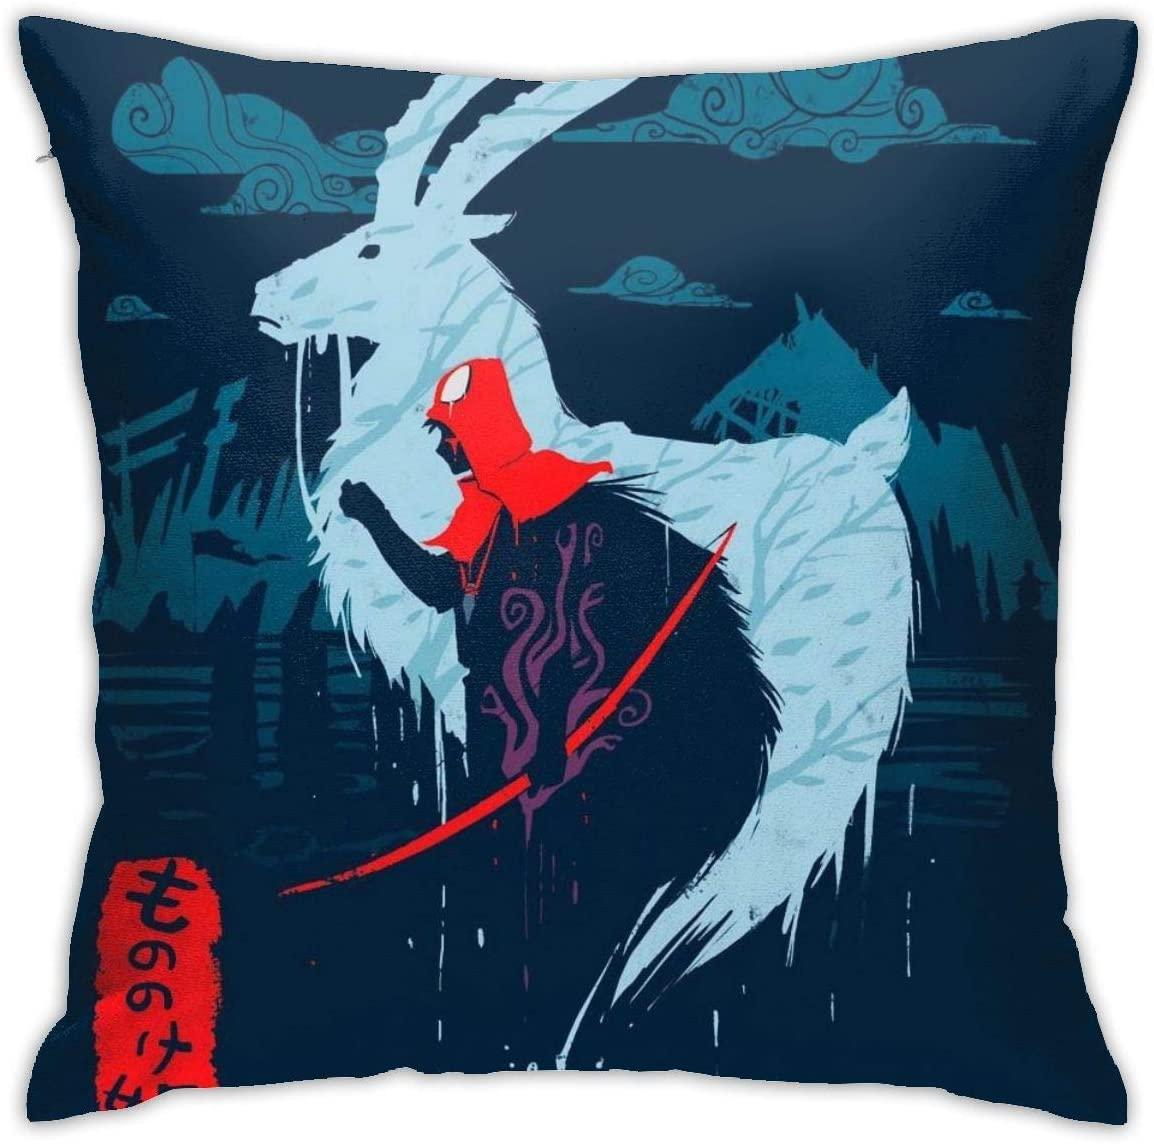 Sofa Bed Chair Mononoke 3D Printing Square Pillow Case 18 X 18 Inches